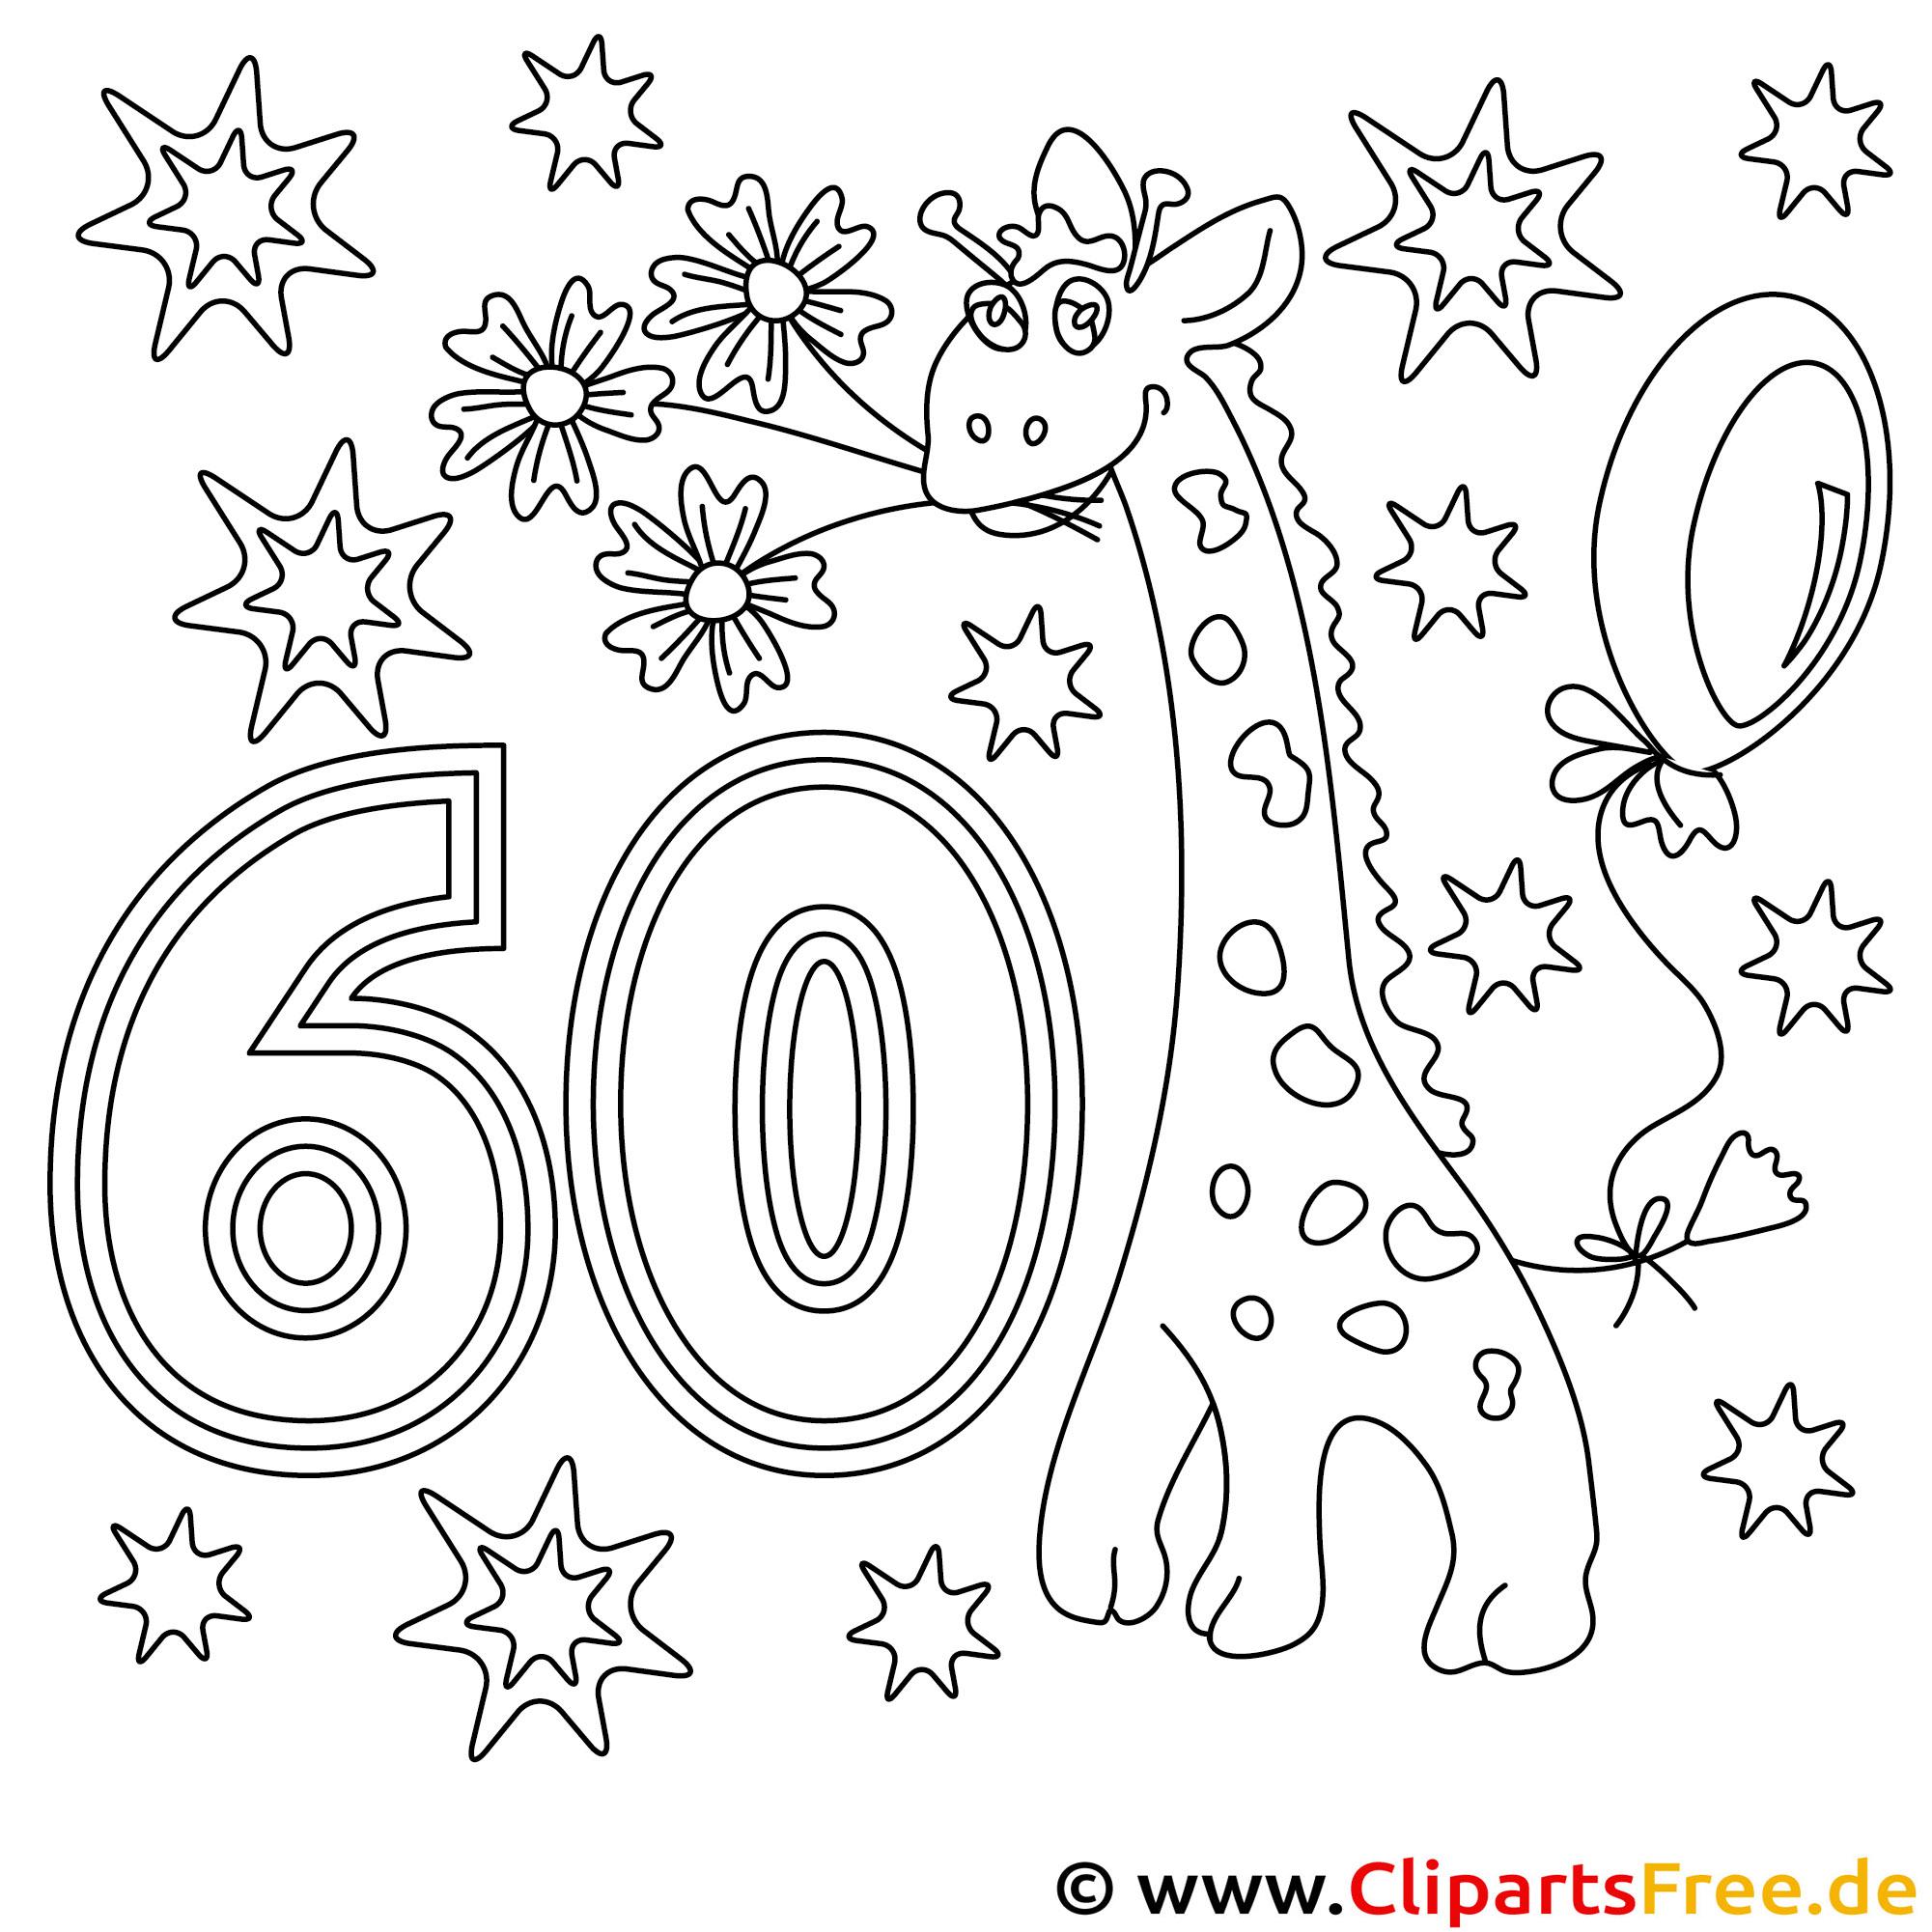 Ausmalbild zum 60. Geburtstag